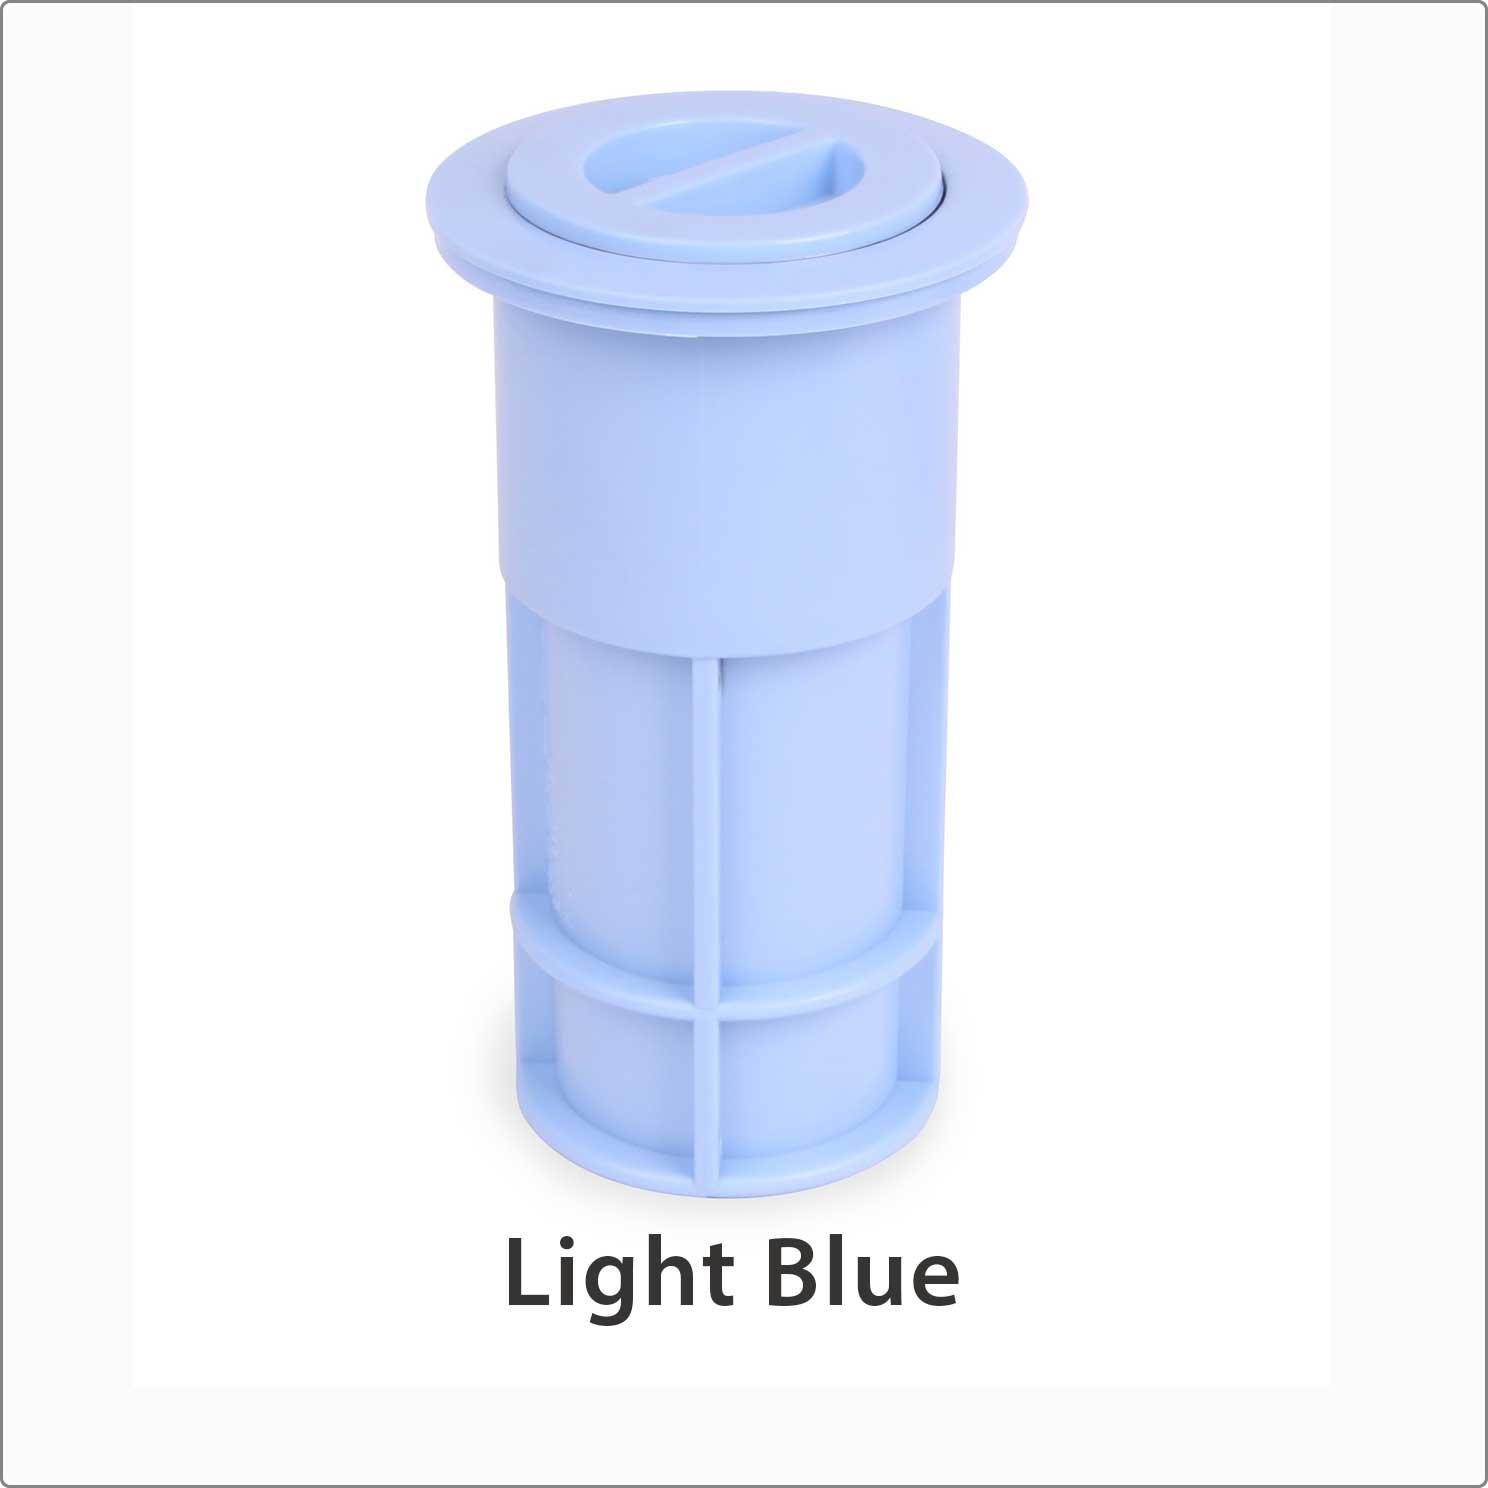 Pole-Holder-Light-Blue.jpg